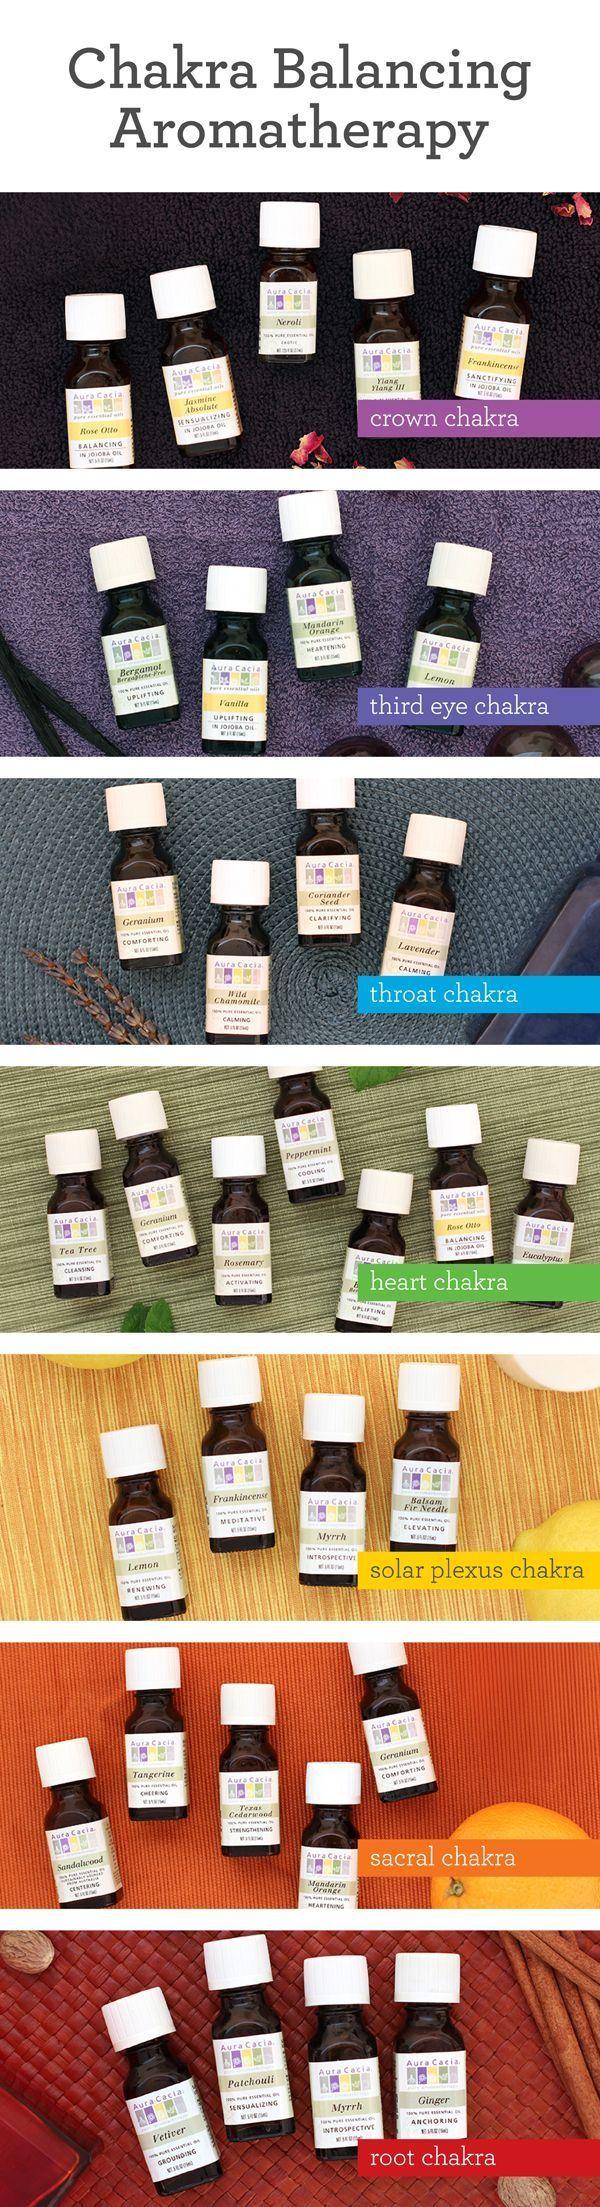 Chakra Balancing Aromatherapy | Feng Shui For Balance | The Tao of Dana